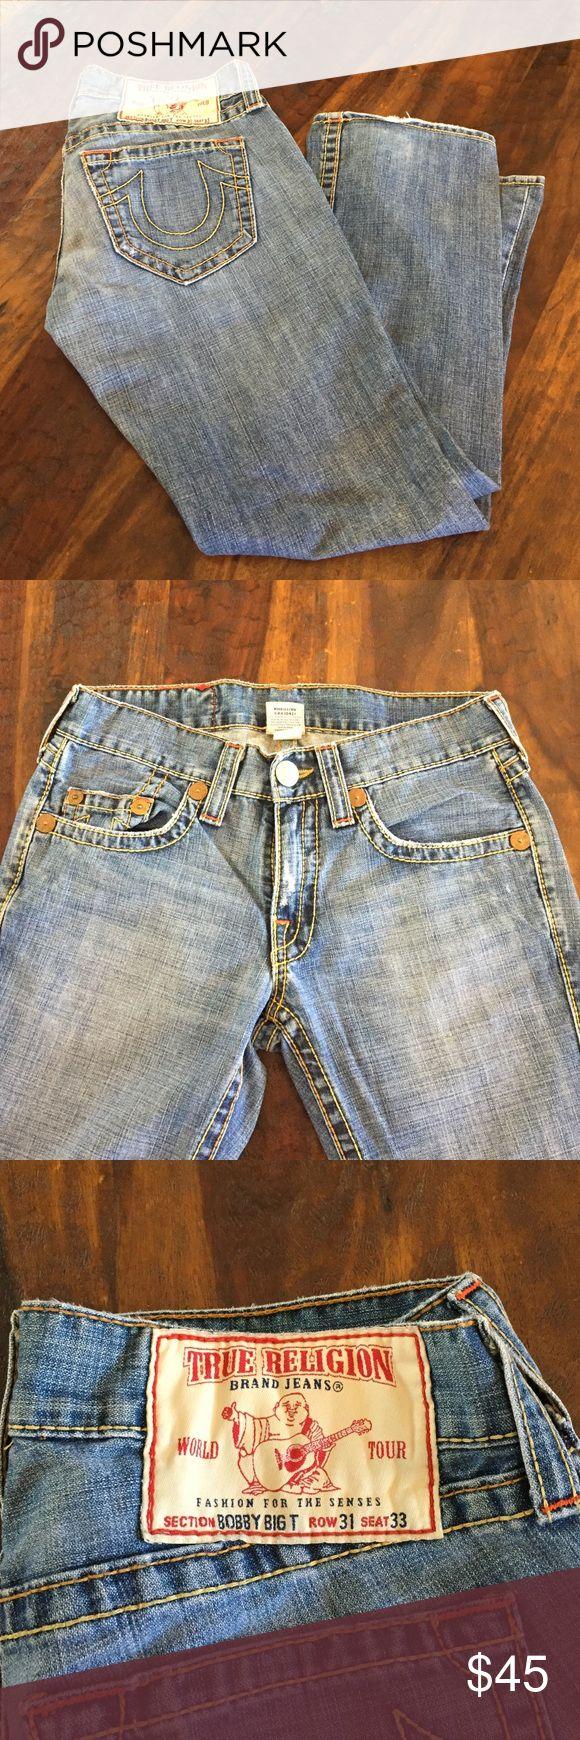 "True Religion Jeans Men's ""Bobby"" Big T sz 31 True Religion Jeans Men's ""Bobby"" Big T. Great condition. Some wear on bottom hem, refer to pictures. Inseam has been hemmed to 29"" True Religion Jeans Straight"